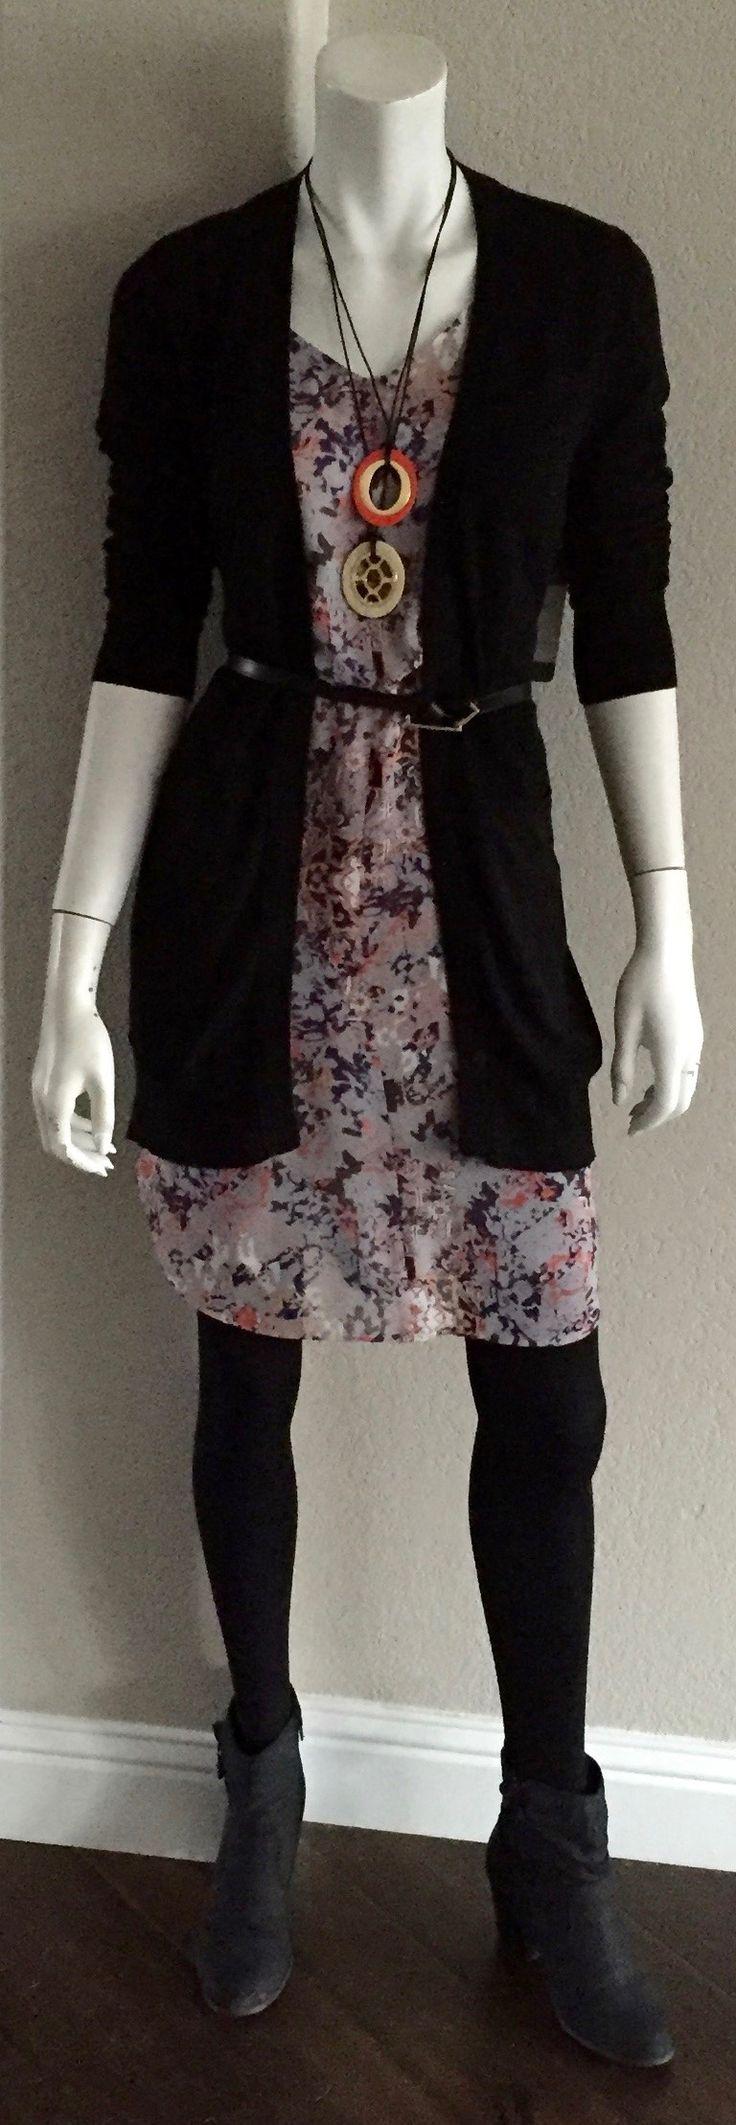 cabi spring '16 Sorrento Cardigan, Fresco Dress & Helio Necklaces w black tights & a skinny belt.  #fallintospring